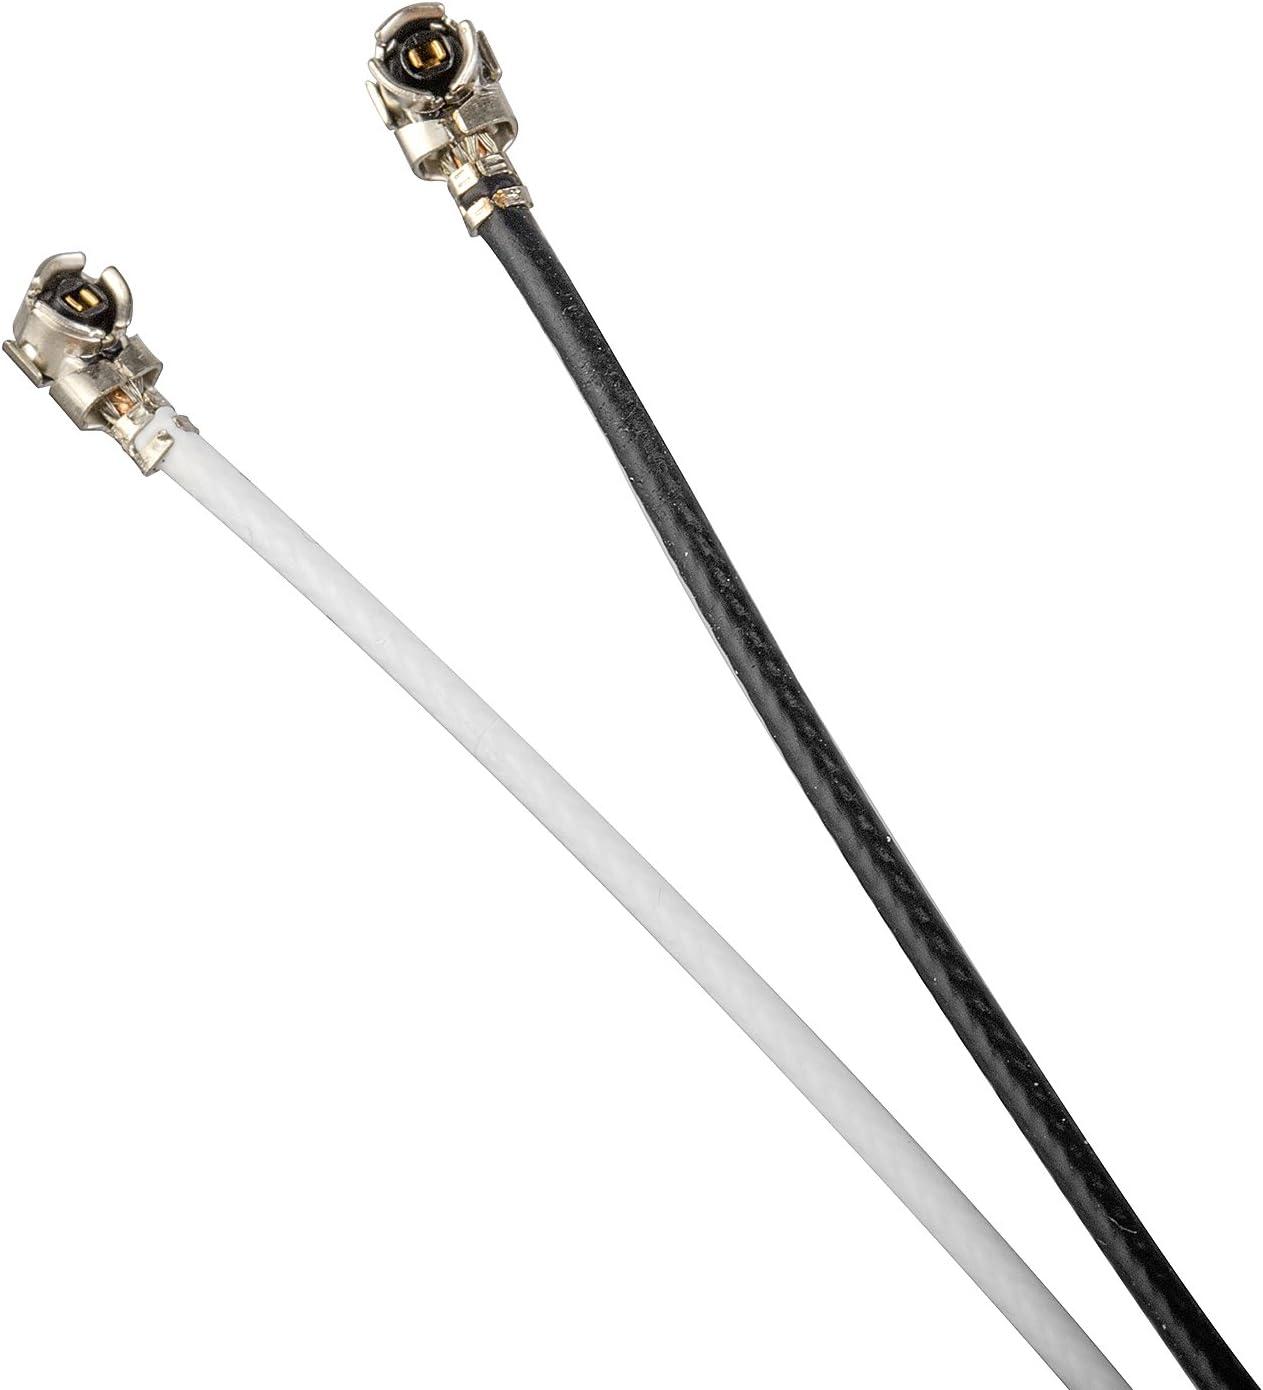 Pair of Internal Antenna for Laptop Mini//Half Mini PCI-e WiFi Bluetooth Card White Aux 28 inch Main Black 24 inch